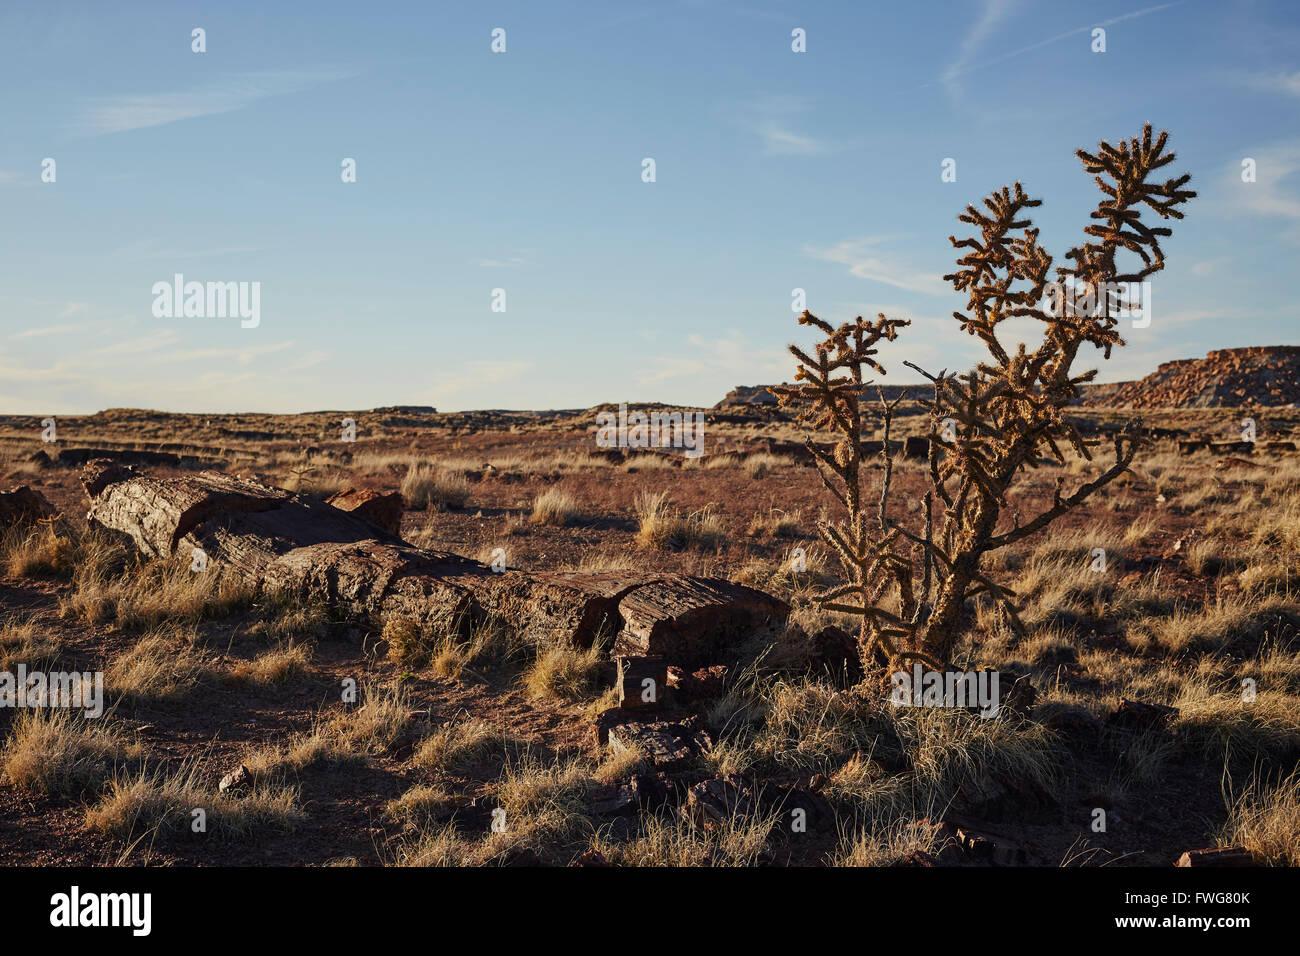 Petrified Forest National Park, Arizona, USA - Stock Image